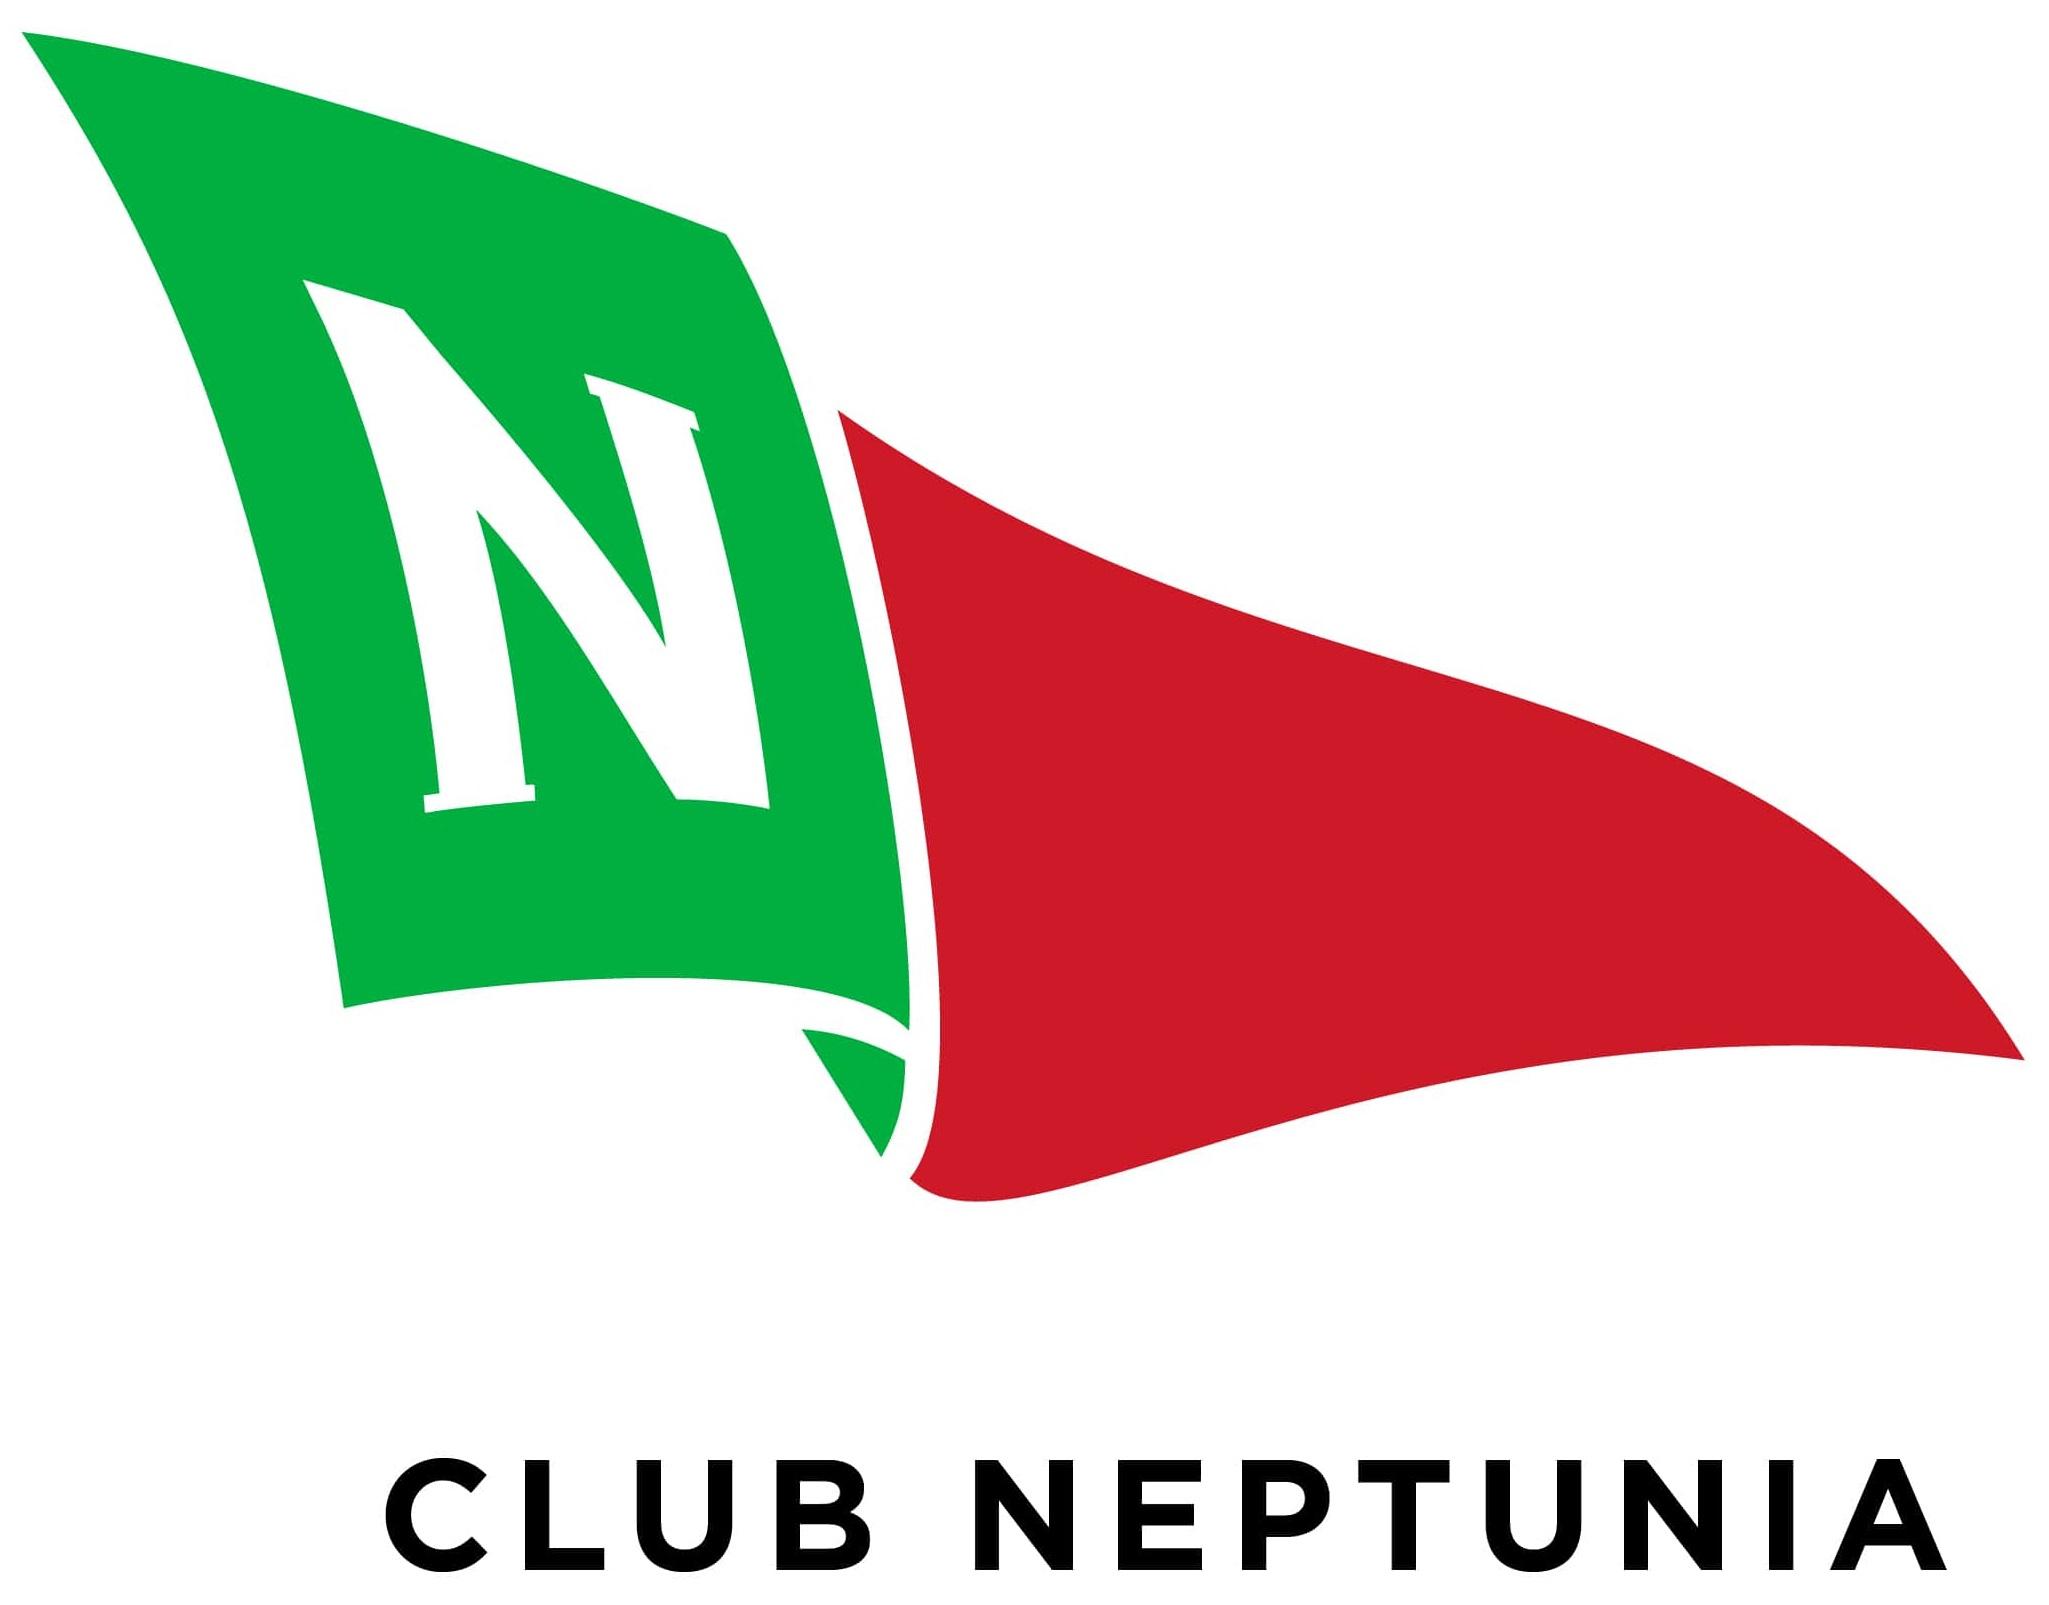 Club Neptunia